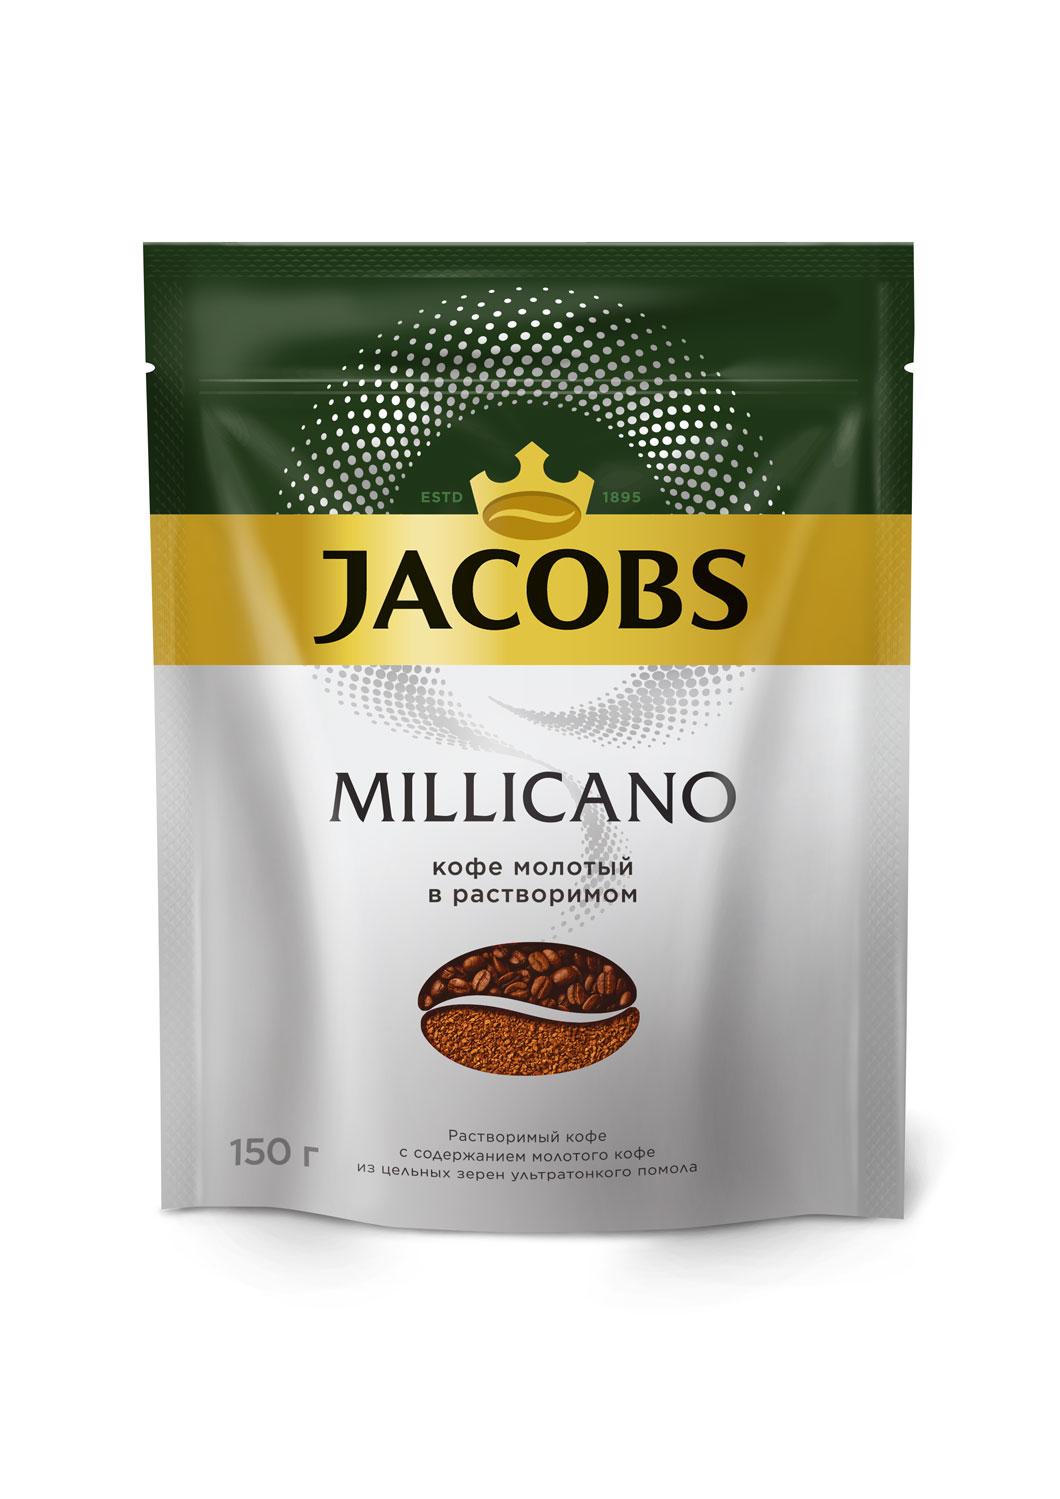 Кофе растворимый Jacobs monarch millicano 150 г